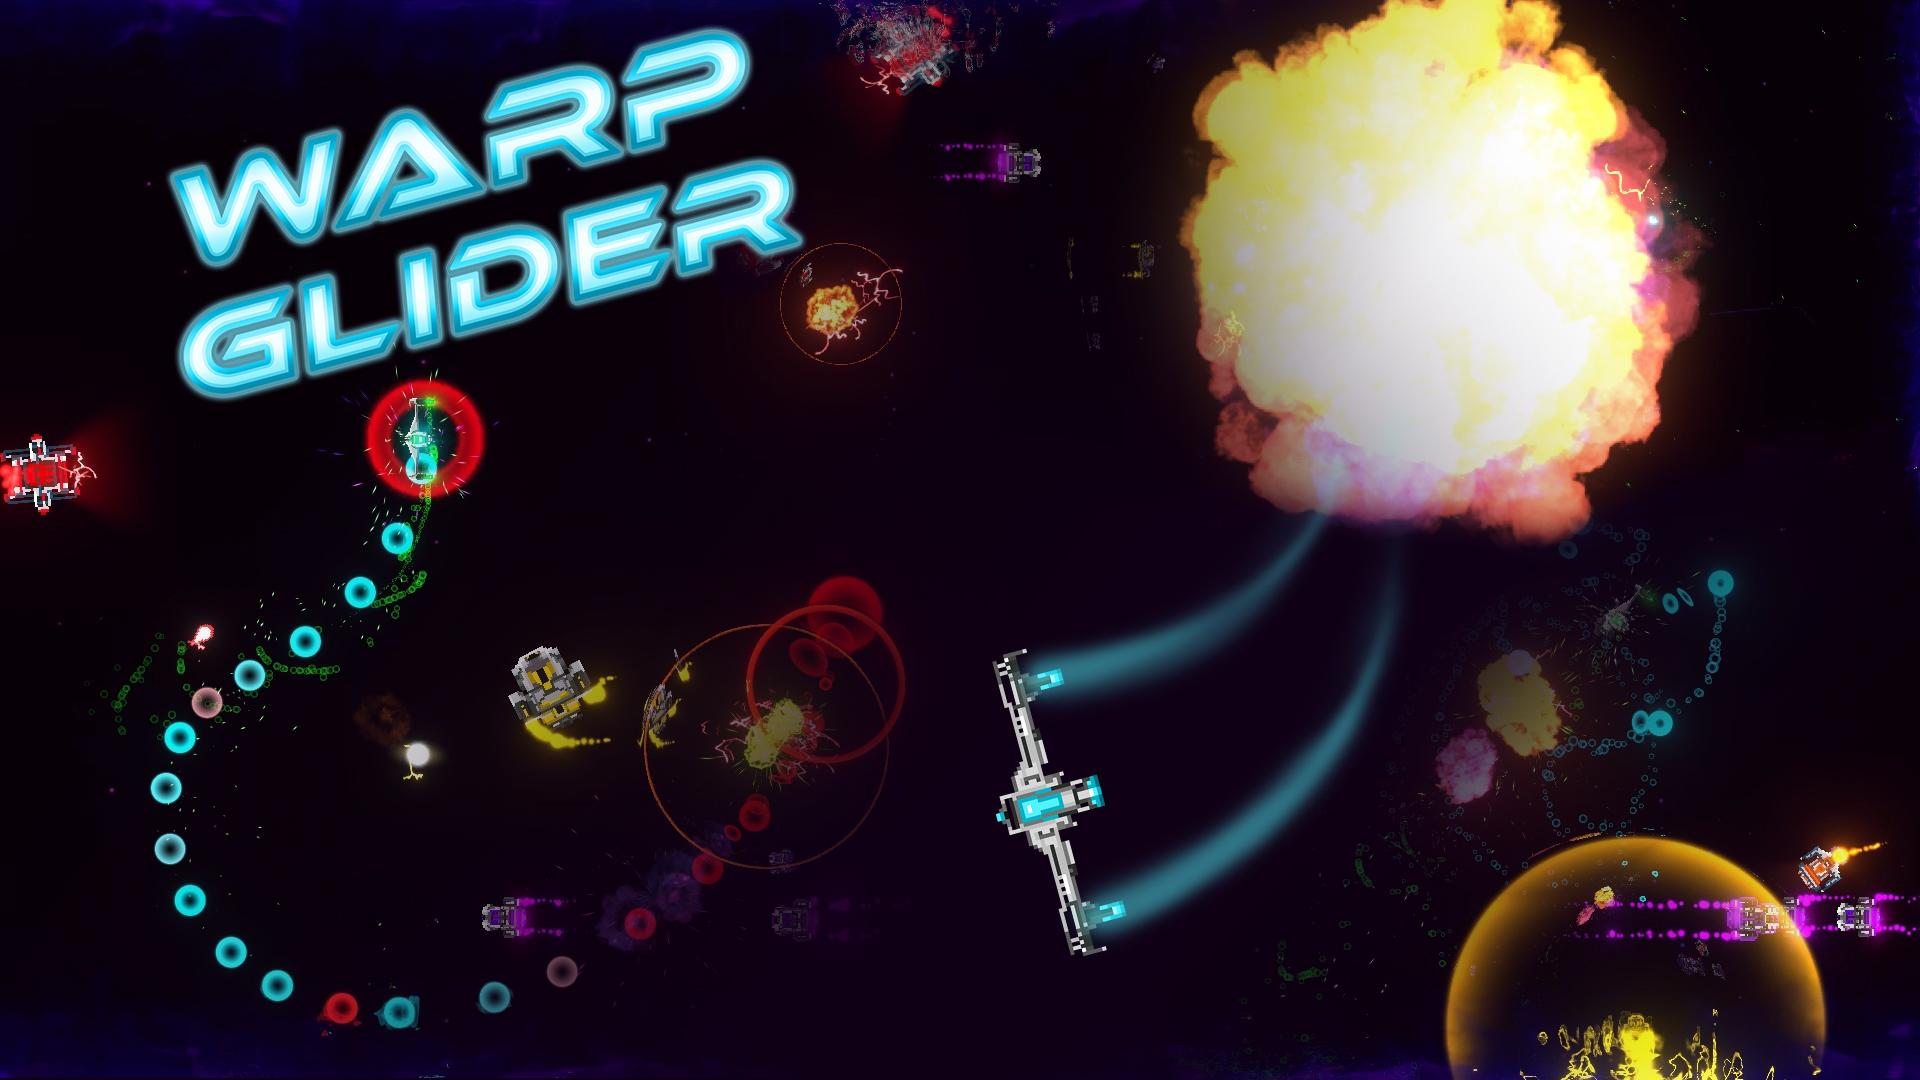 Warp Glider In Depth Review: Gideon's Gaming